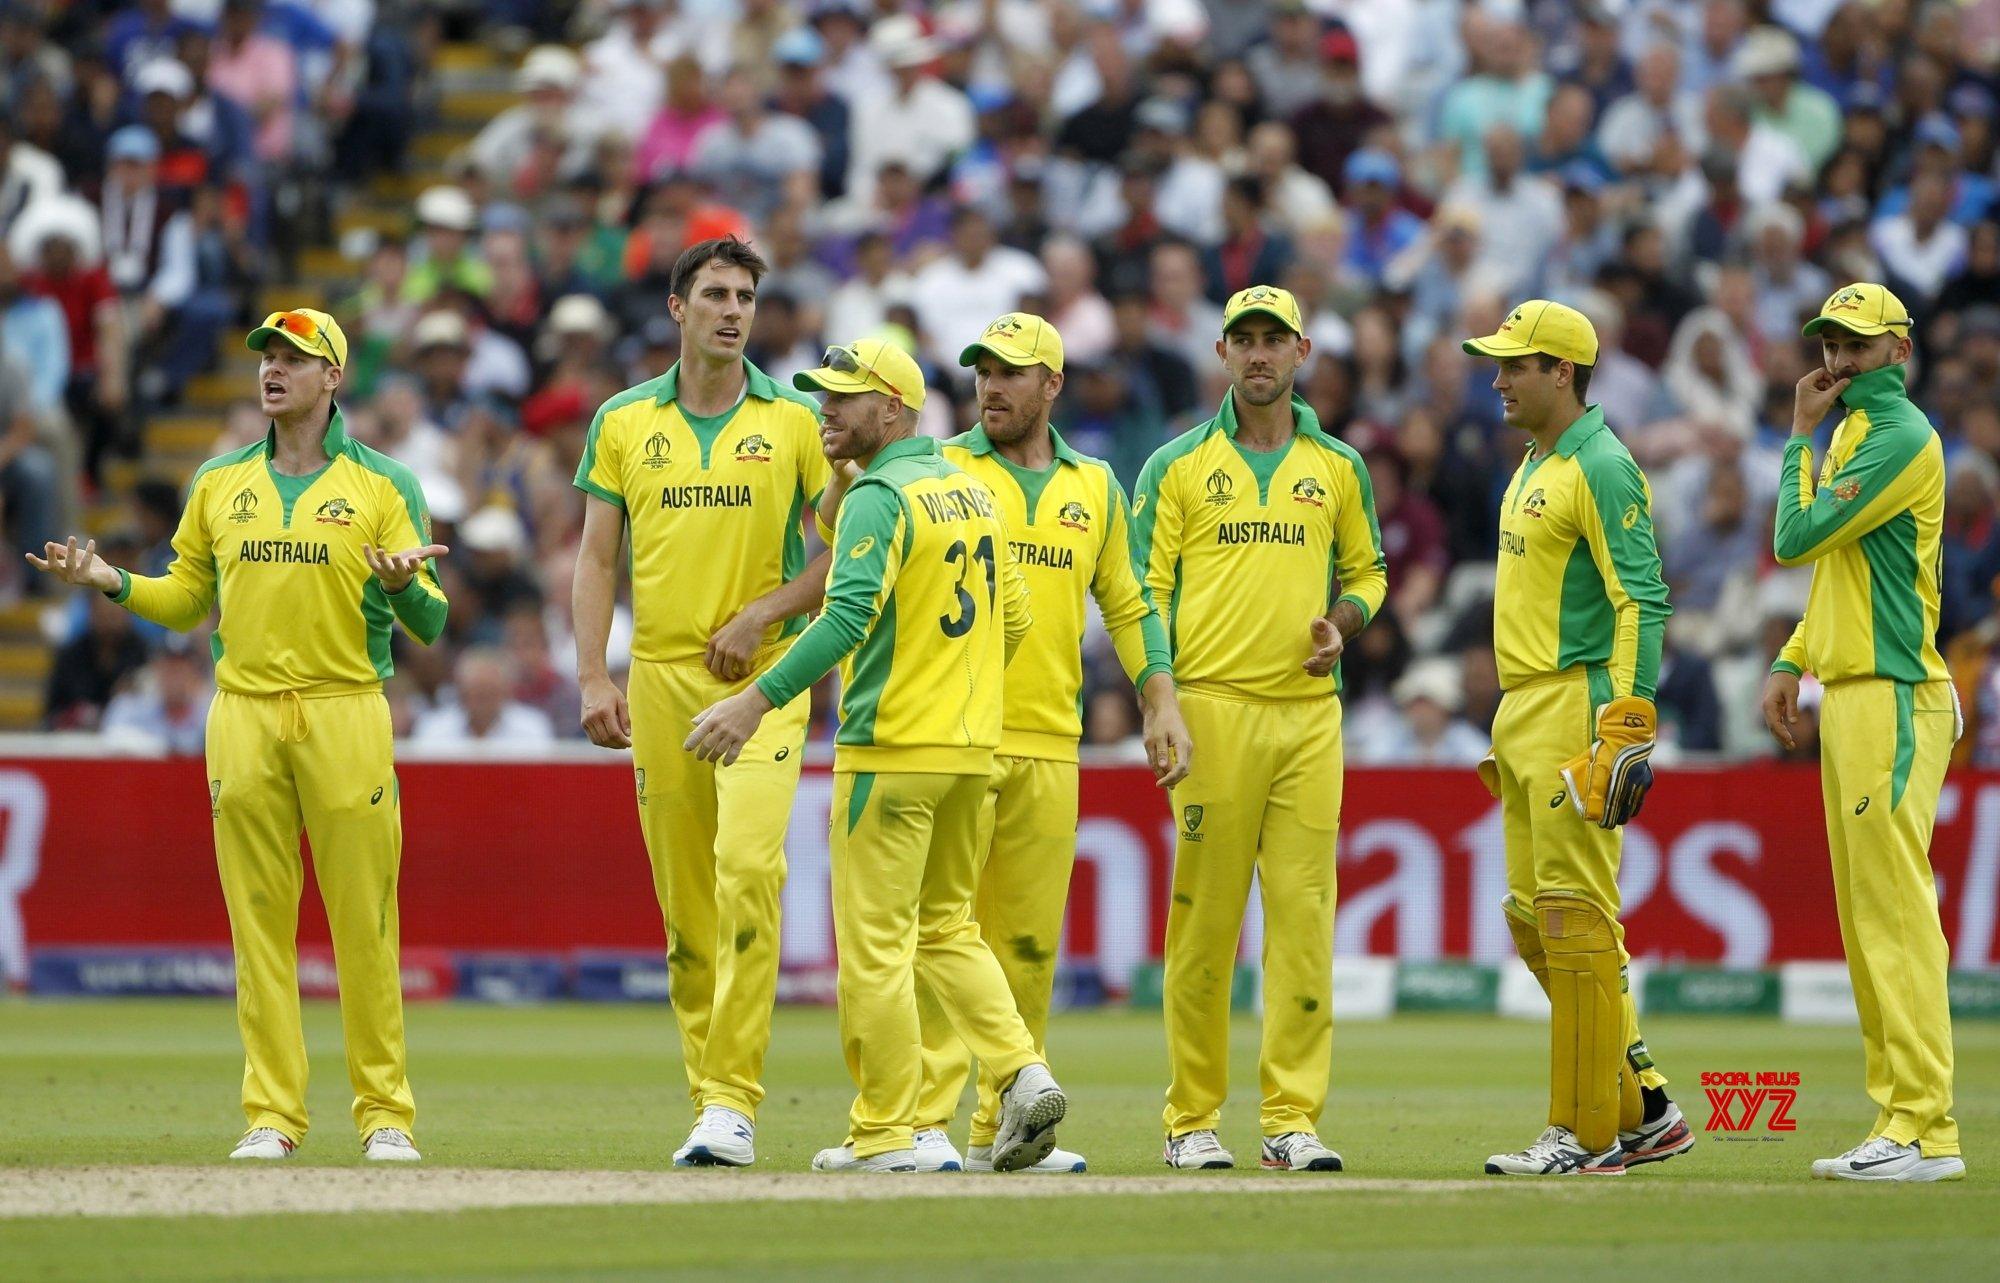 Birmingham (England): 2019 World Cup - 2nd Semi - final - Australia Vs England (Batch - 43) #Gallery